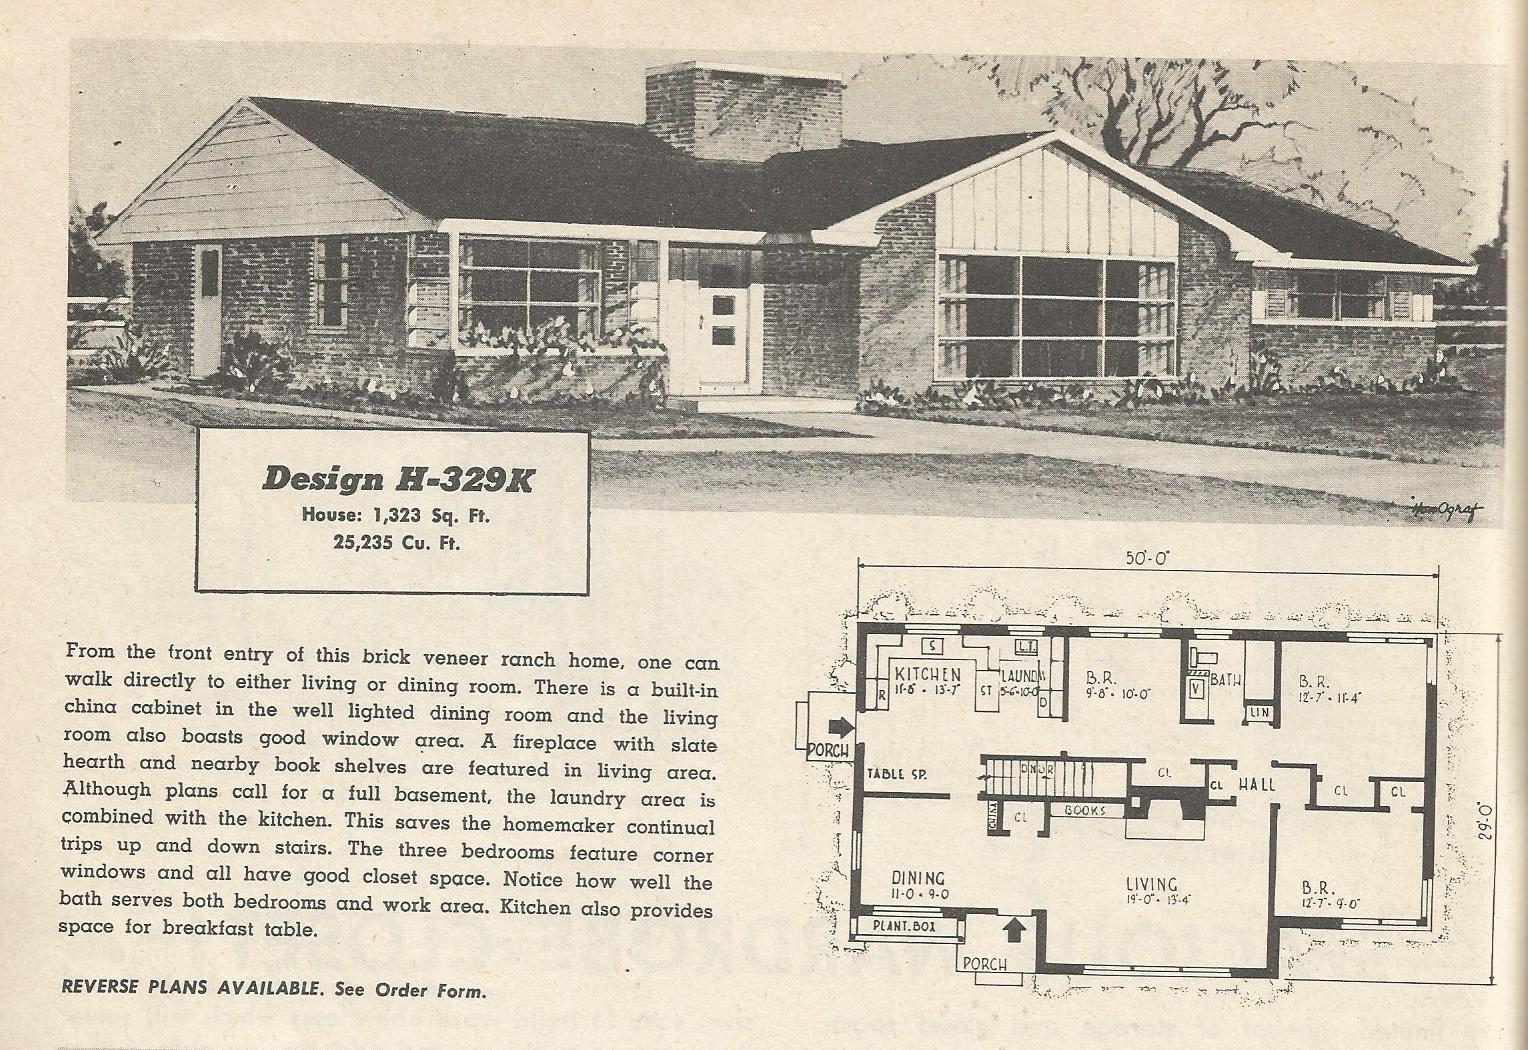 vintage house plans 329?w=300&h=206 vintage house plans 1950s mid century modern and modest part 2,House Plans 1950s